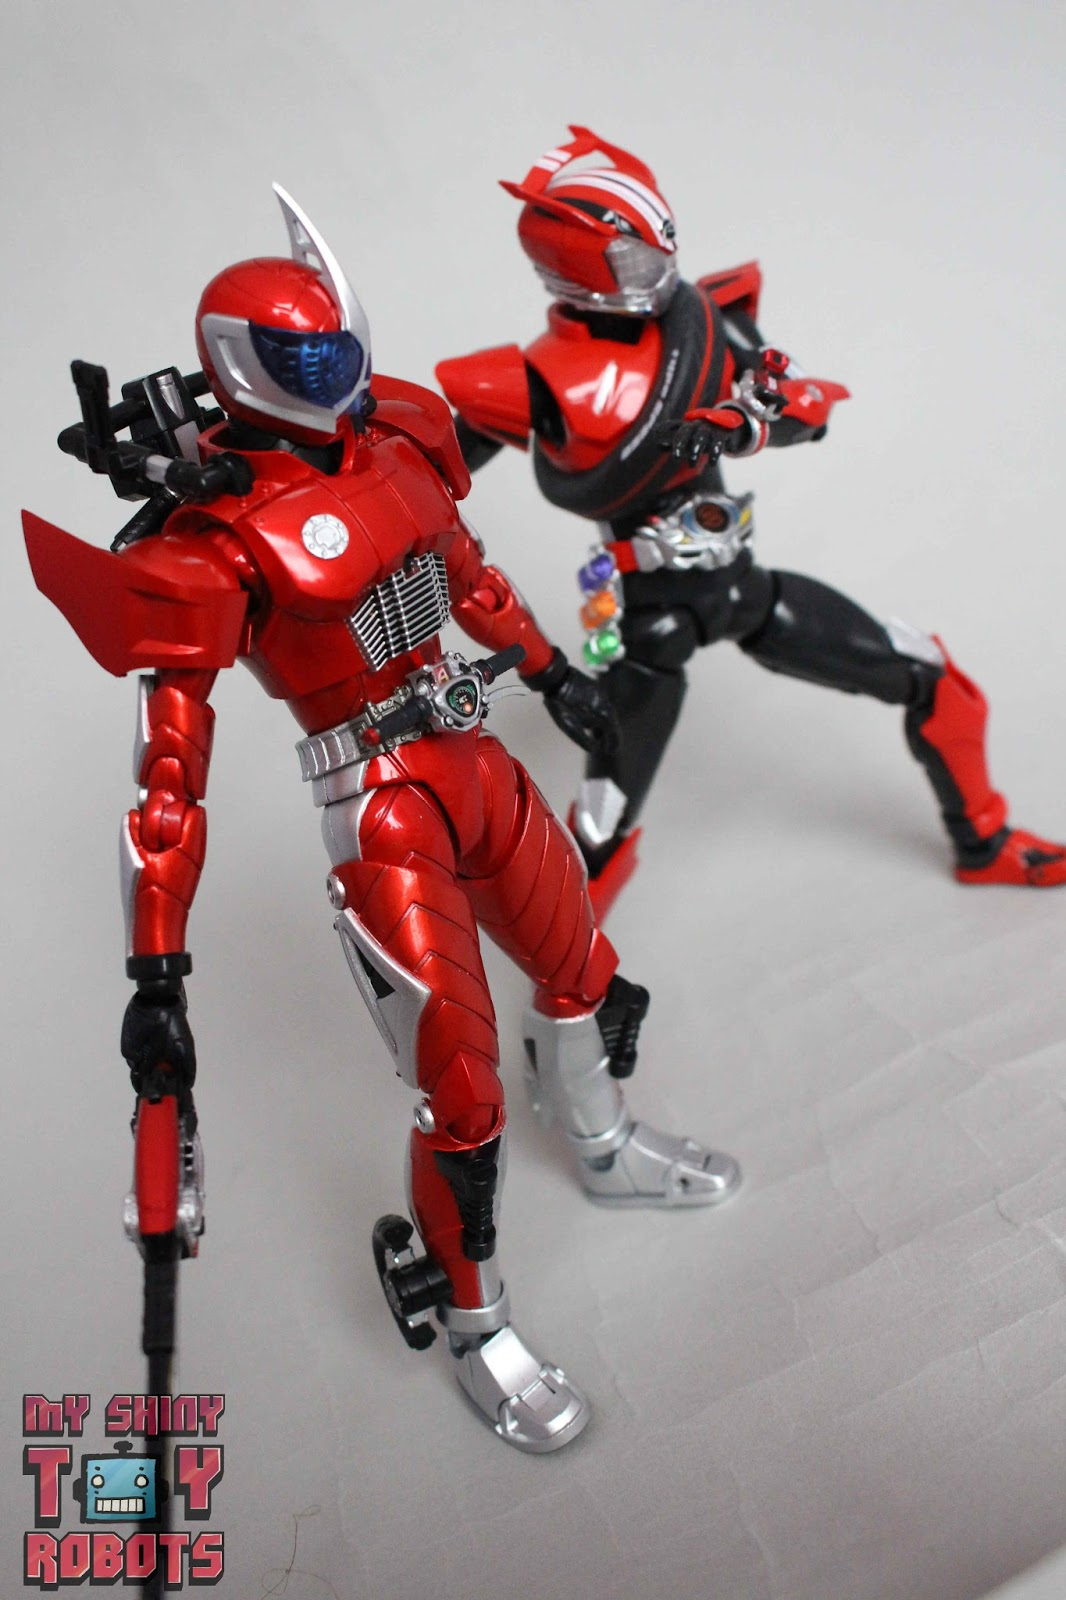 Ryu Terui - Kamen Rider Wiki  Kamen Rider Accel